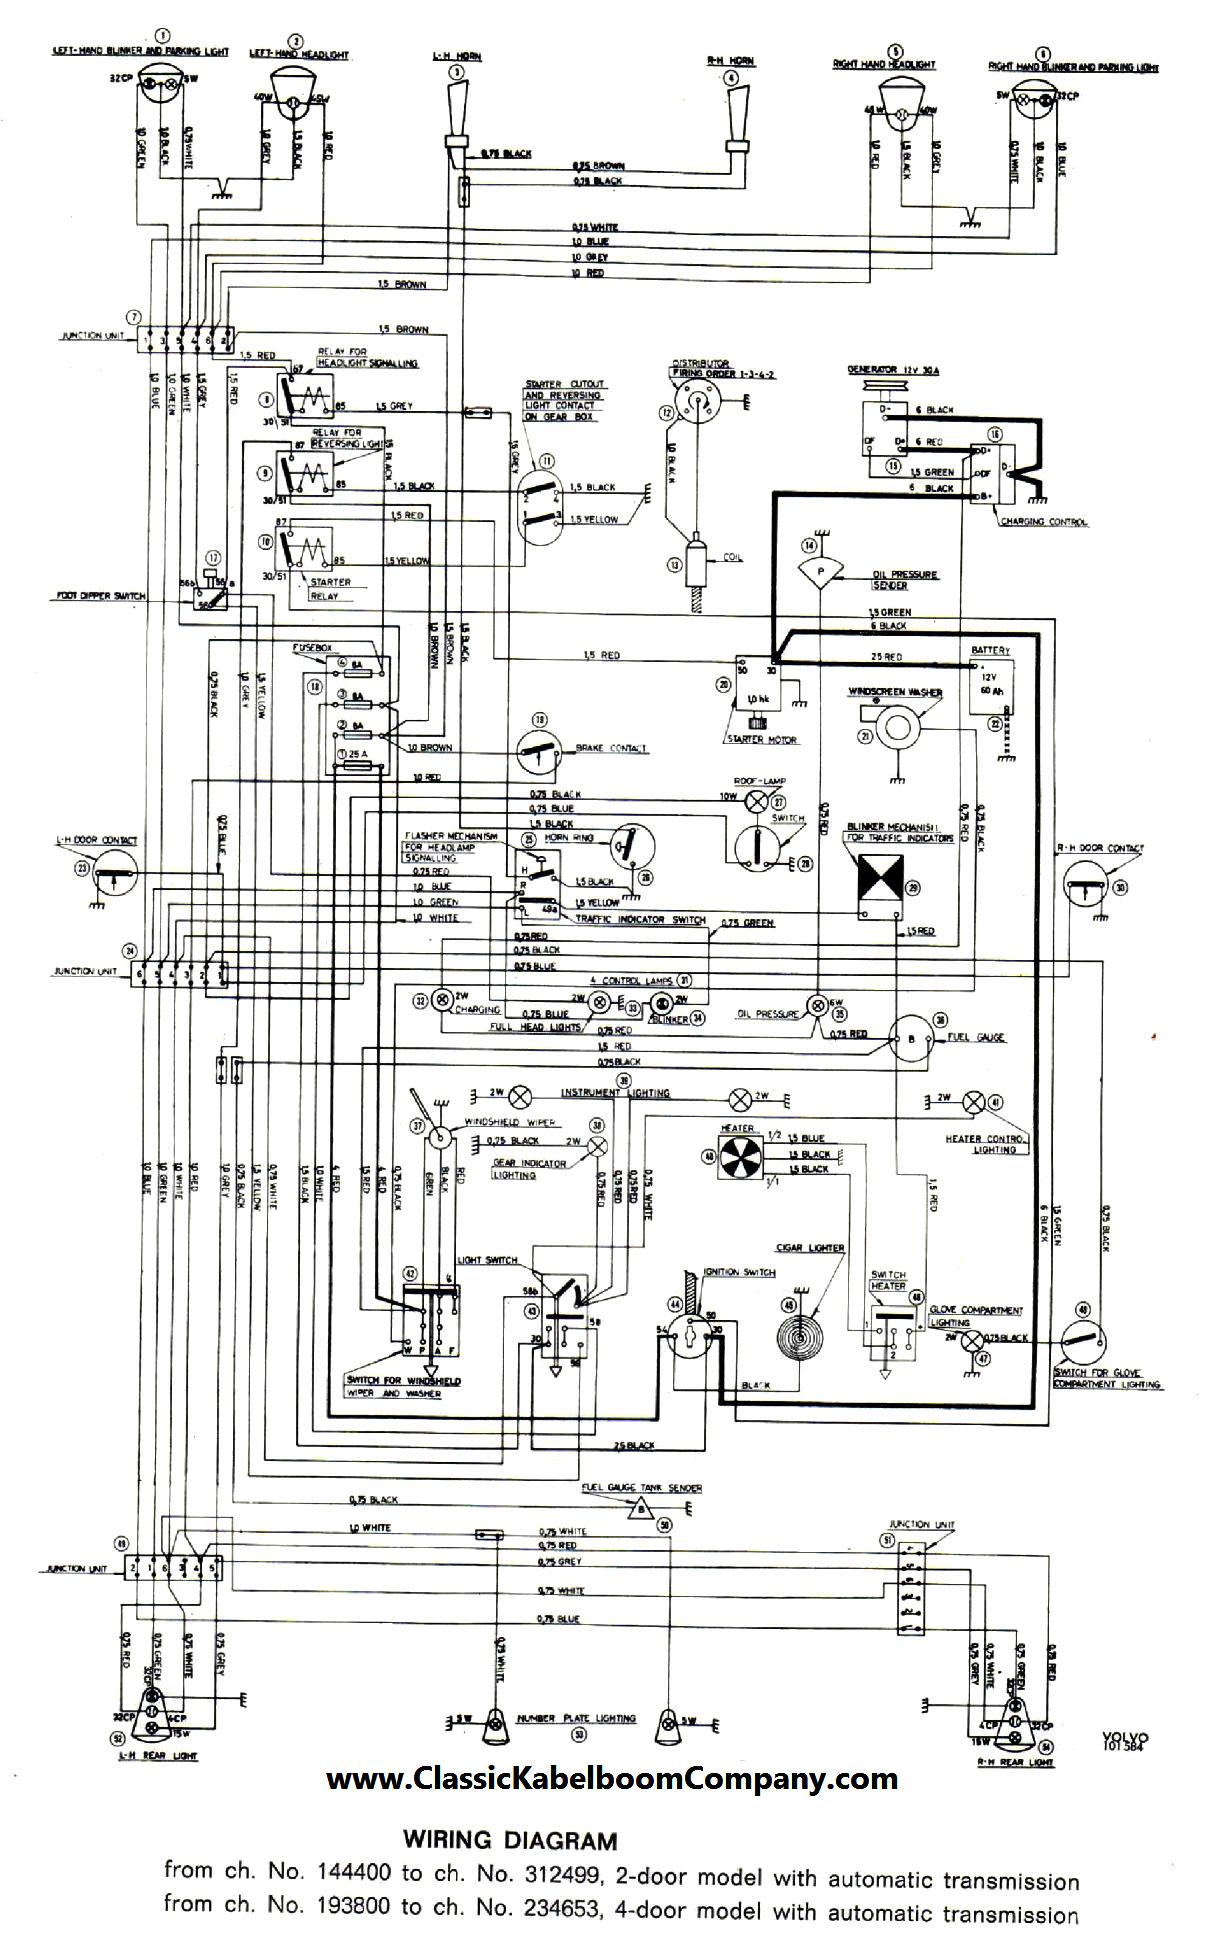 Auto rickshaw wiring diagram wiring diagram midoriva jzgreentown eaton autoshift 2 wiring diagrams repair wiring scheme gentex ztvhl3 wiring diagram asfbconference2016 Choice Image